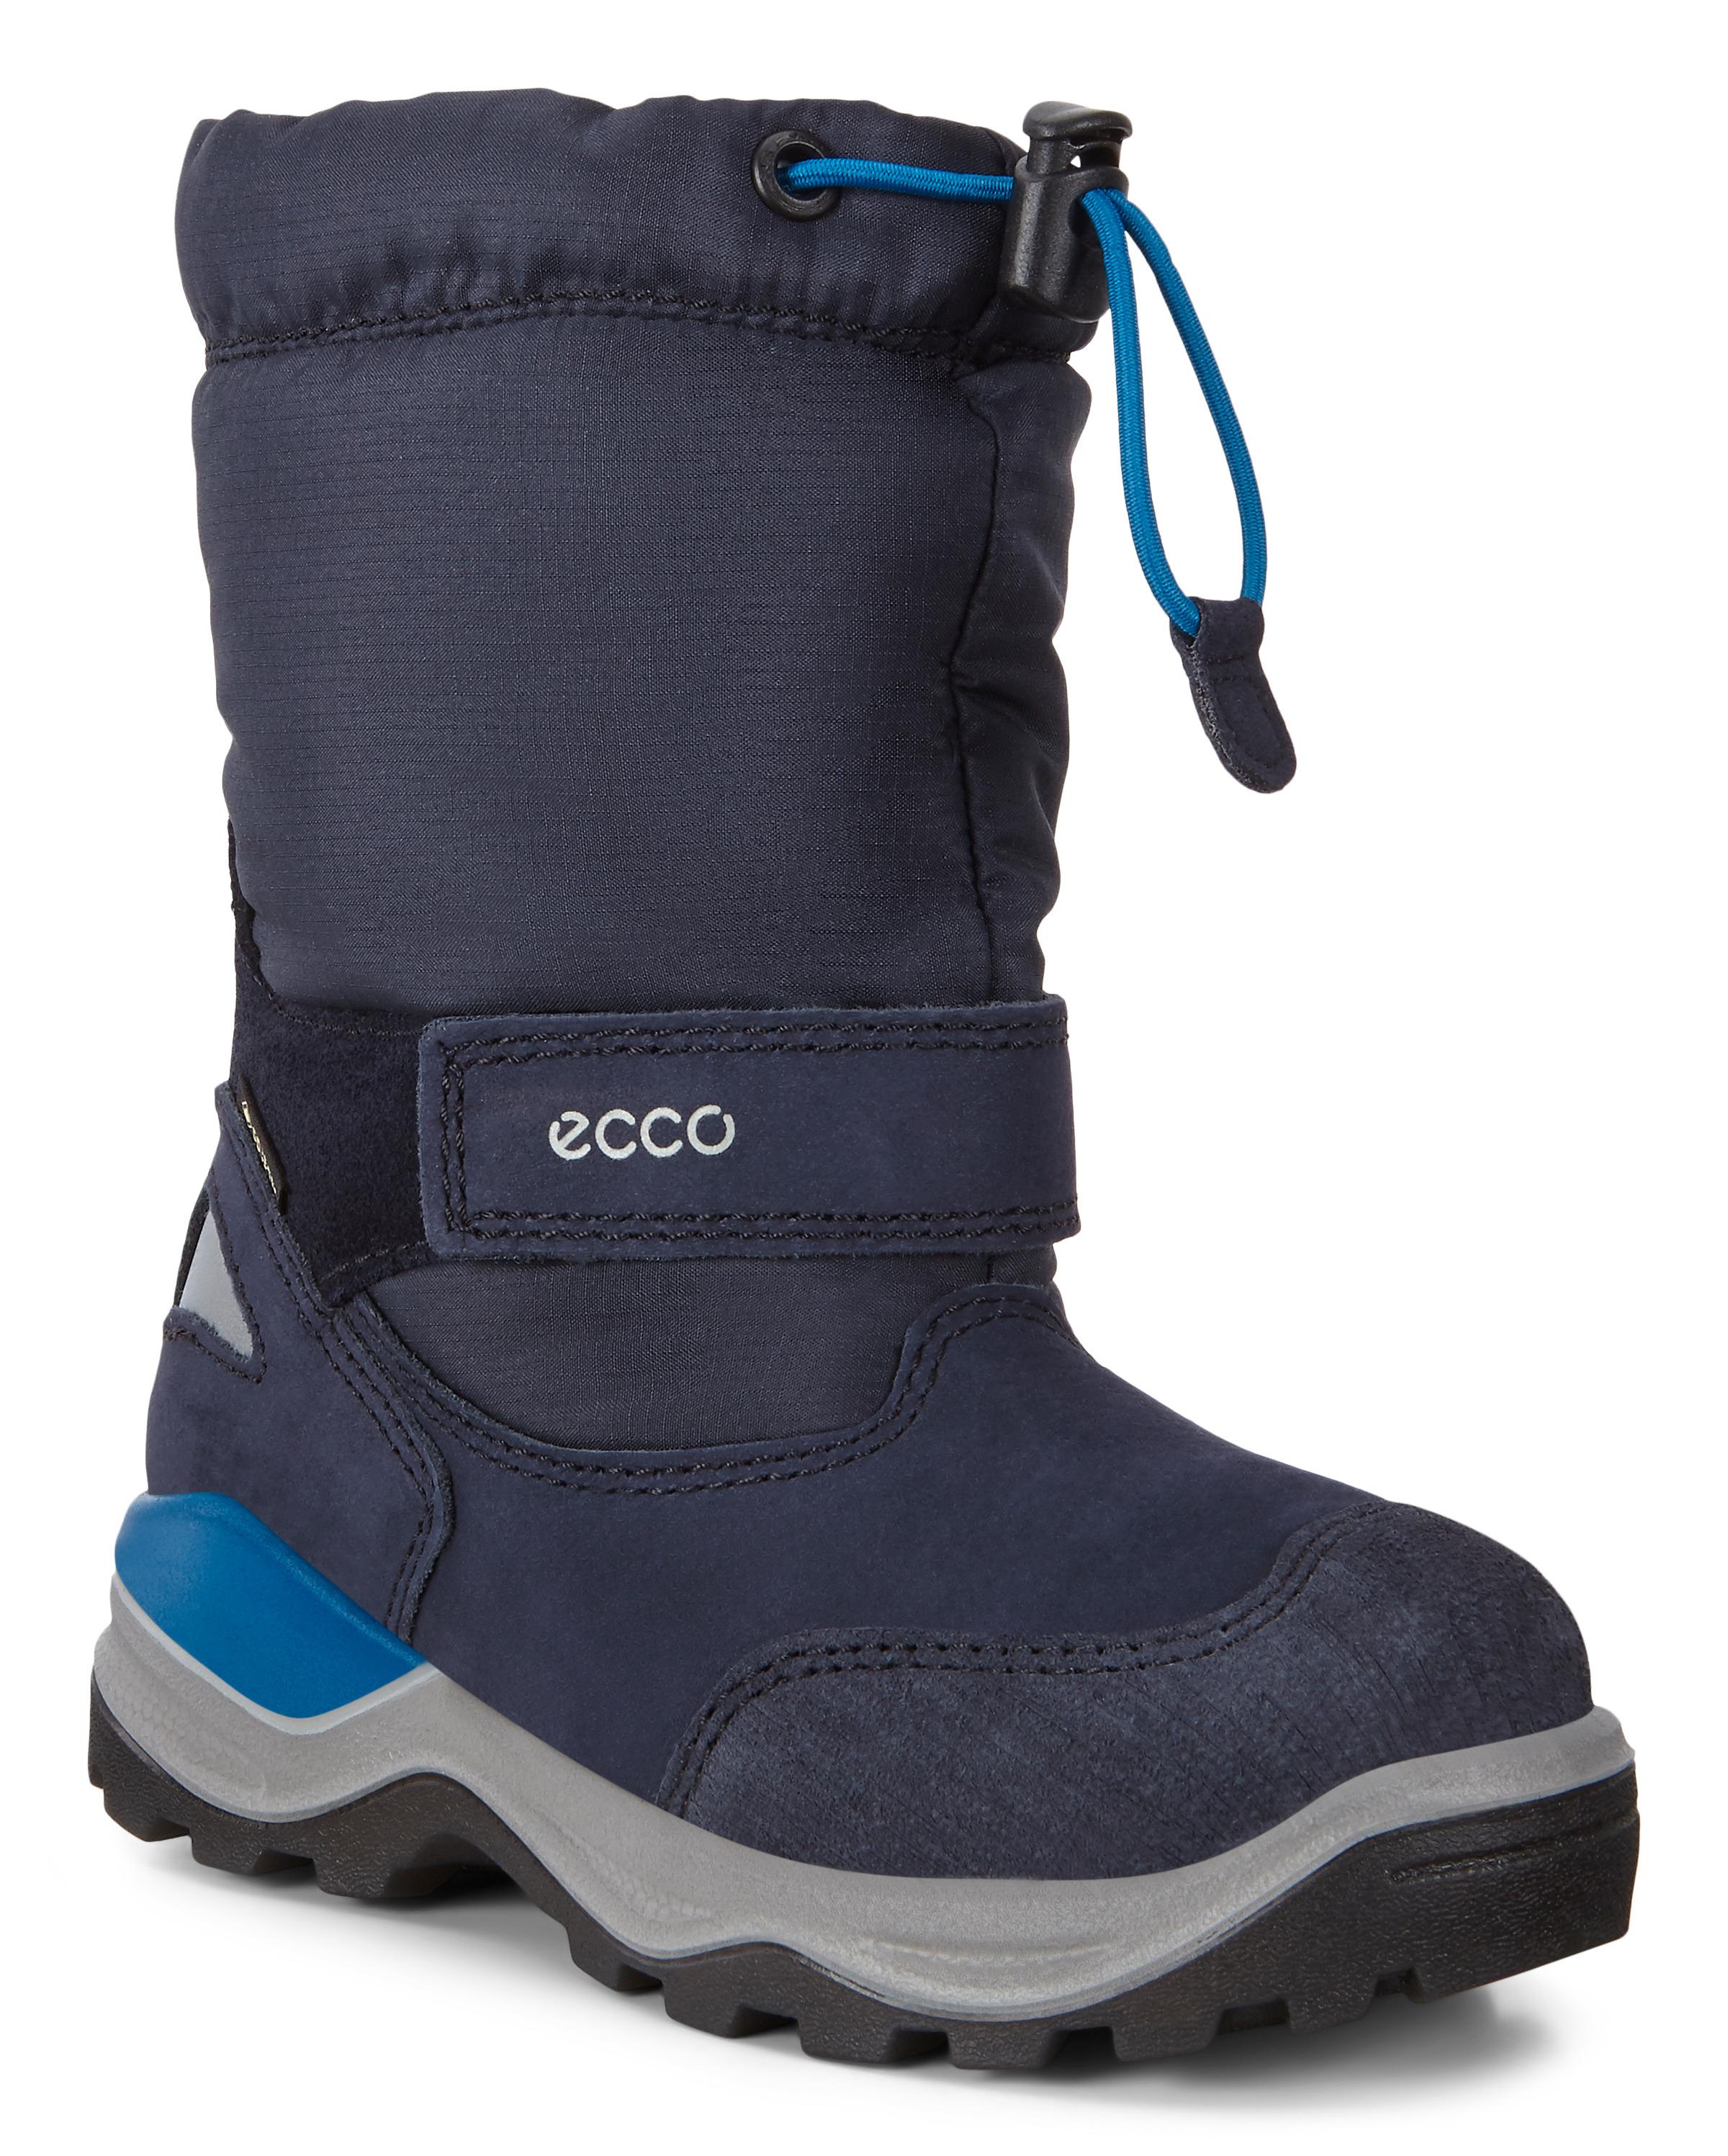 Ecco® Kinder Offiziellen Shop Shop SchuheIm Offiziellen Kinder Kinder Offiziellen SchuheIm SchuheIm Ecco® w0knOP